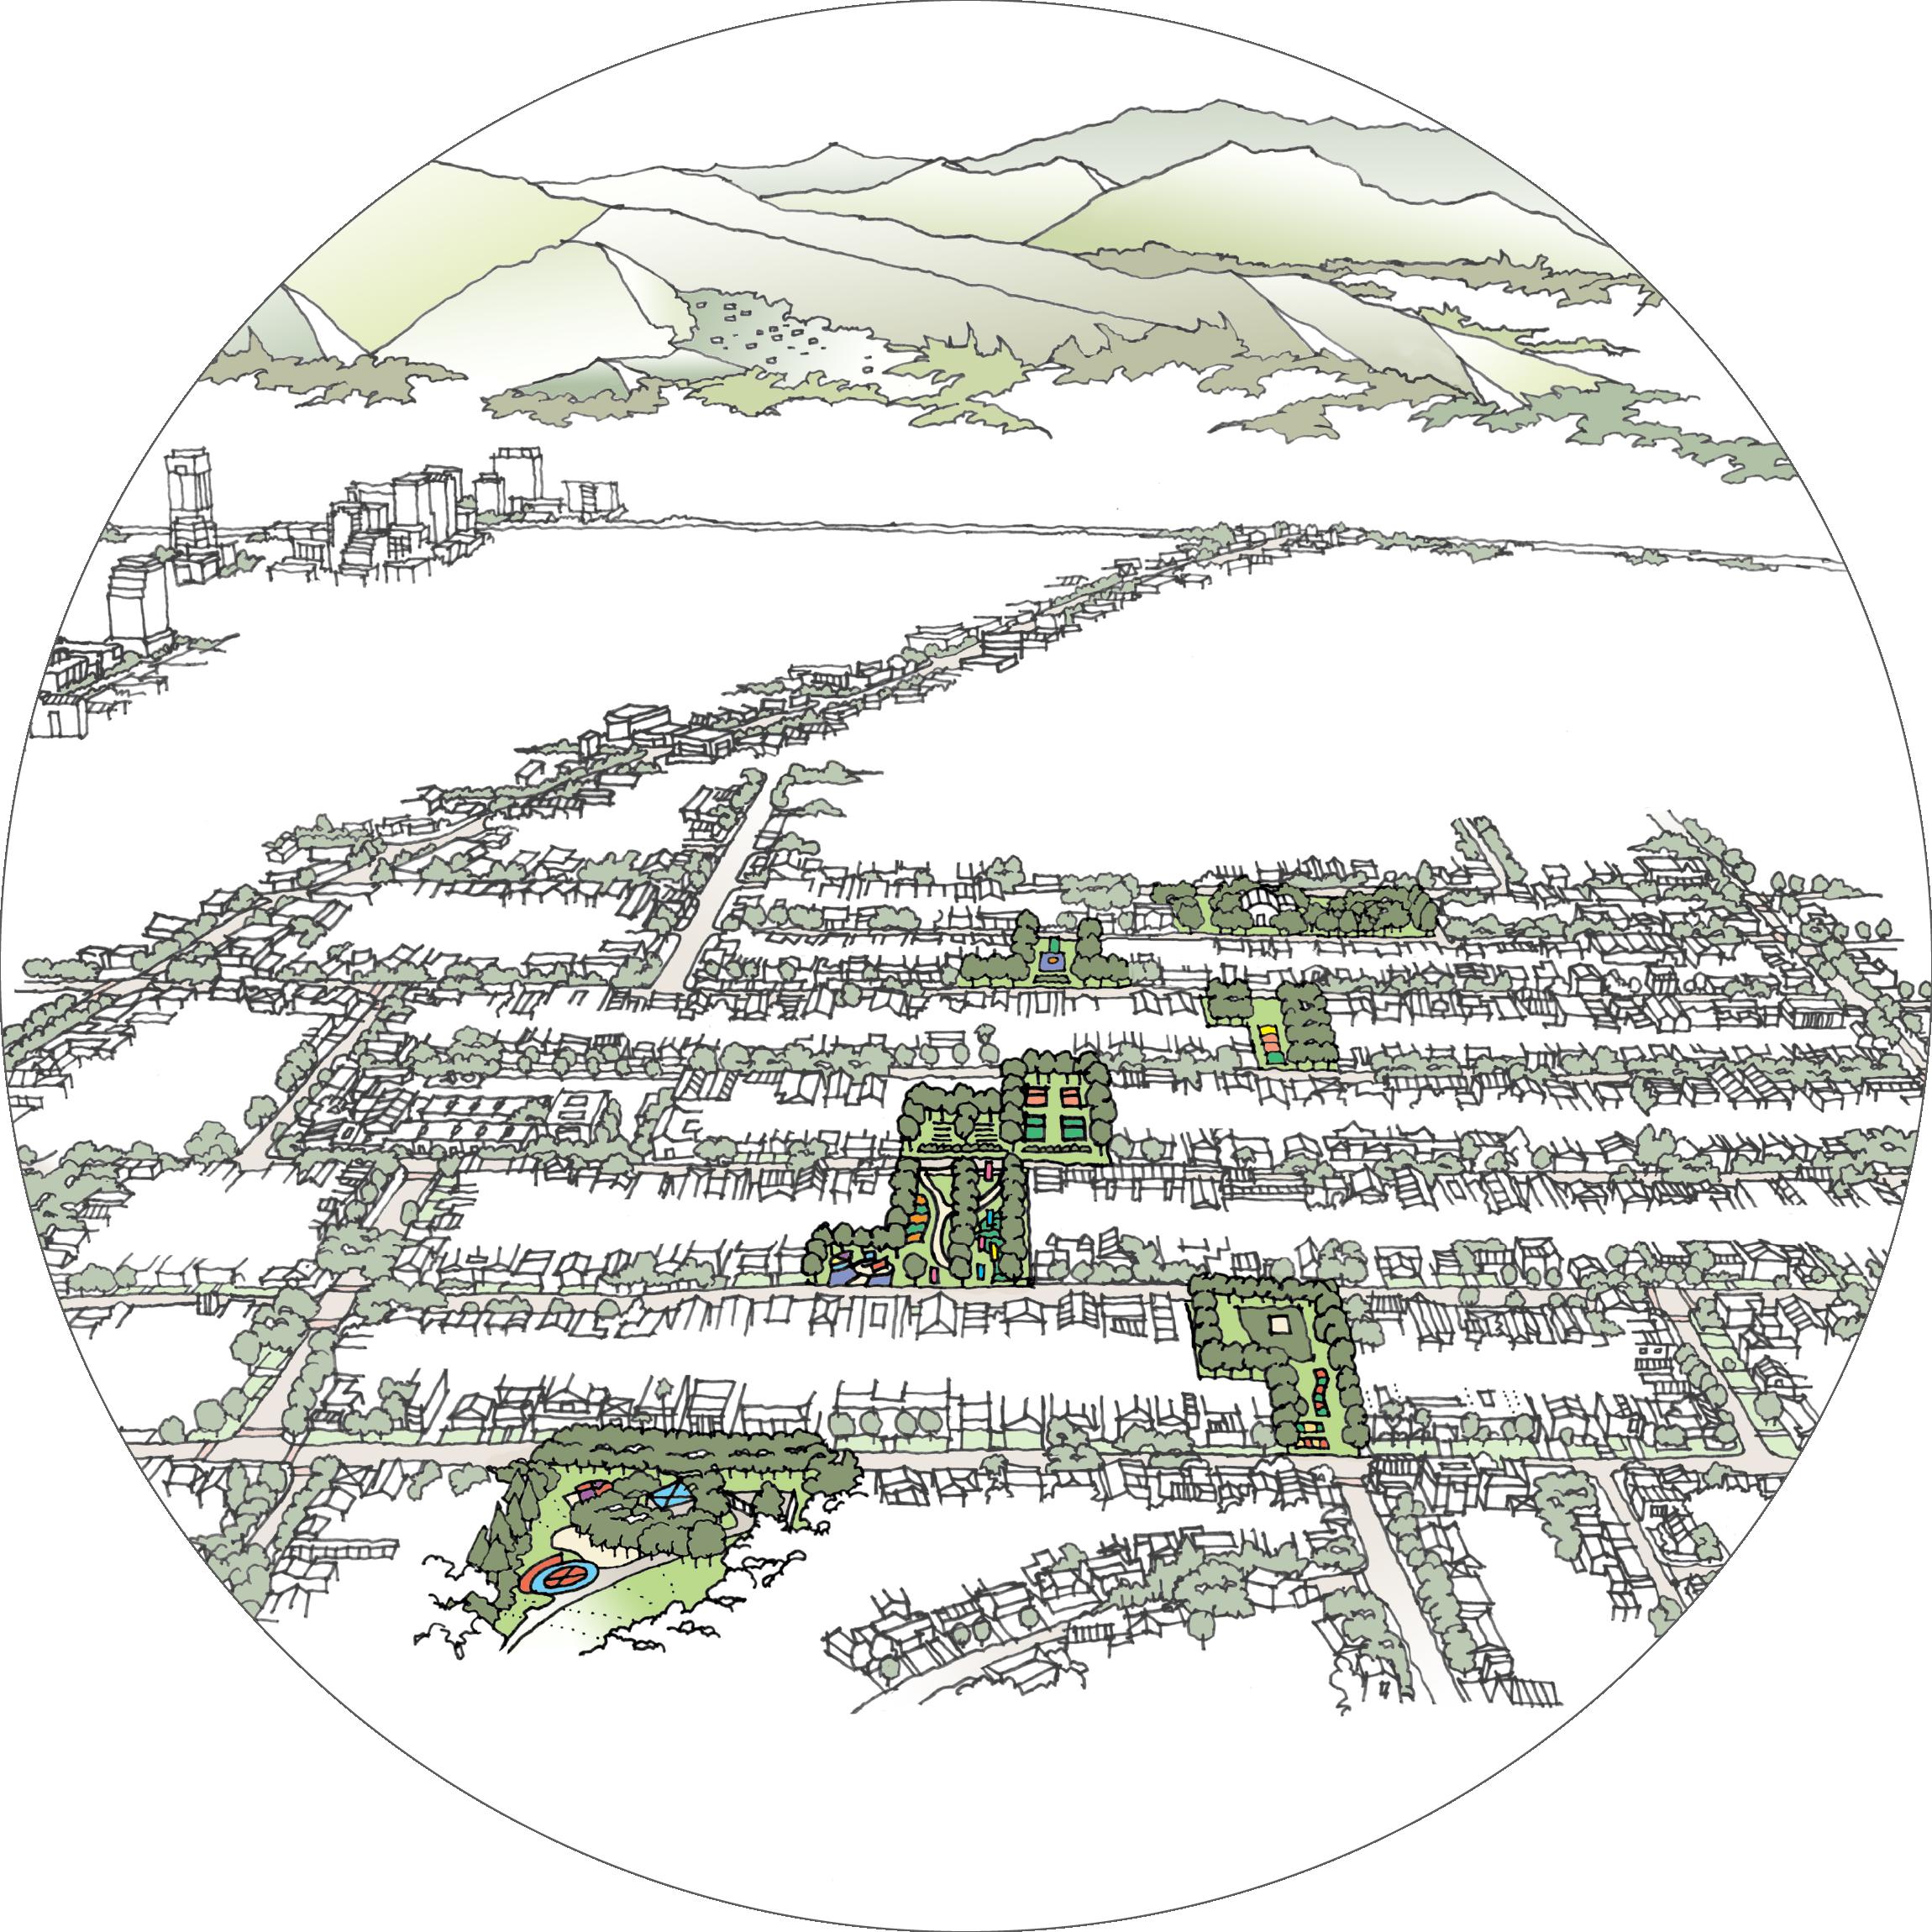 City of Glendale Plans